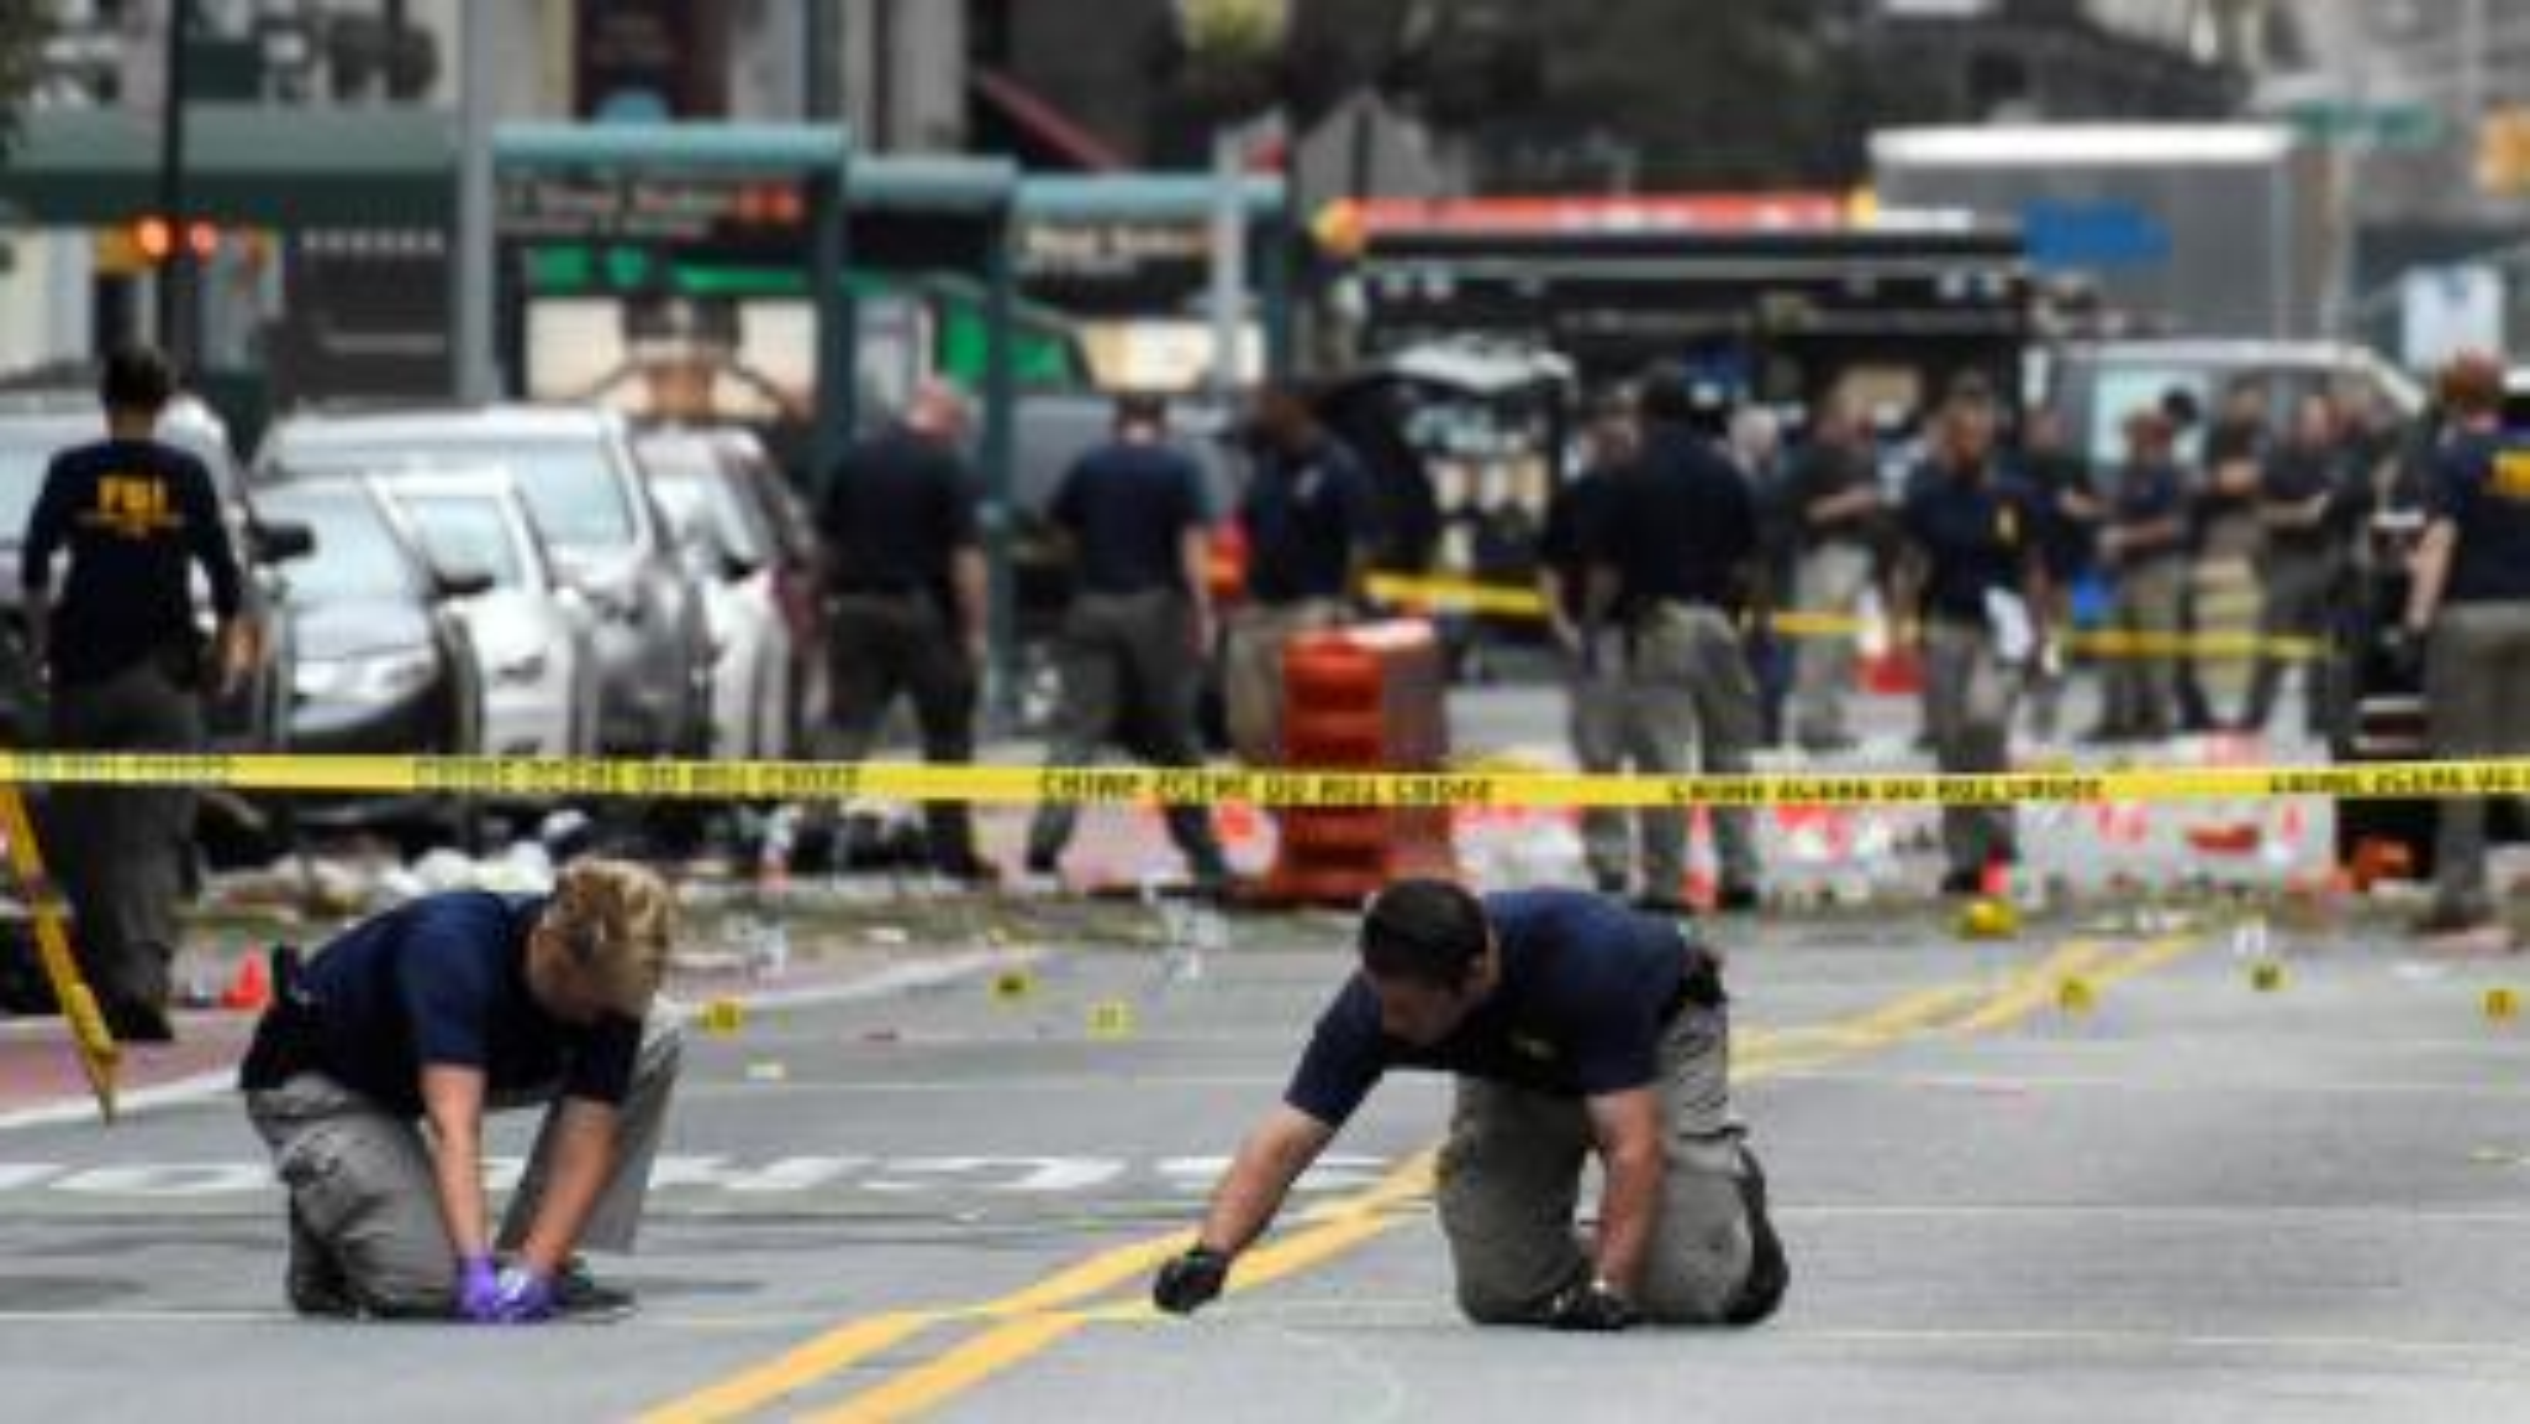 FBI Chelsea bombing investigation